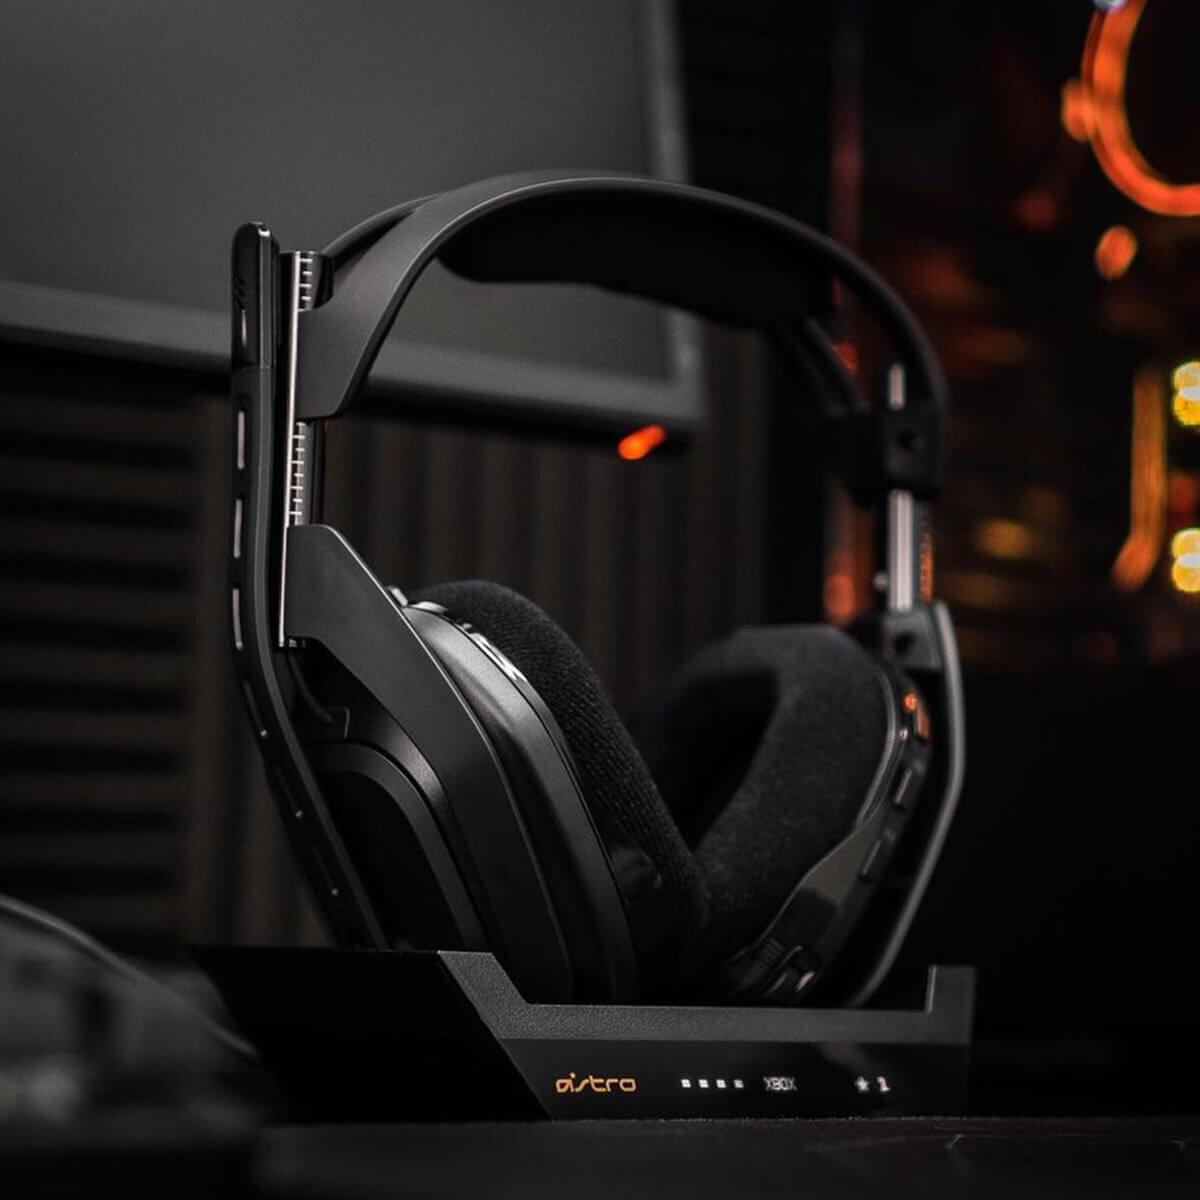 Minimalist Gaming Headset & Microphone